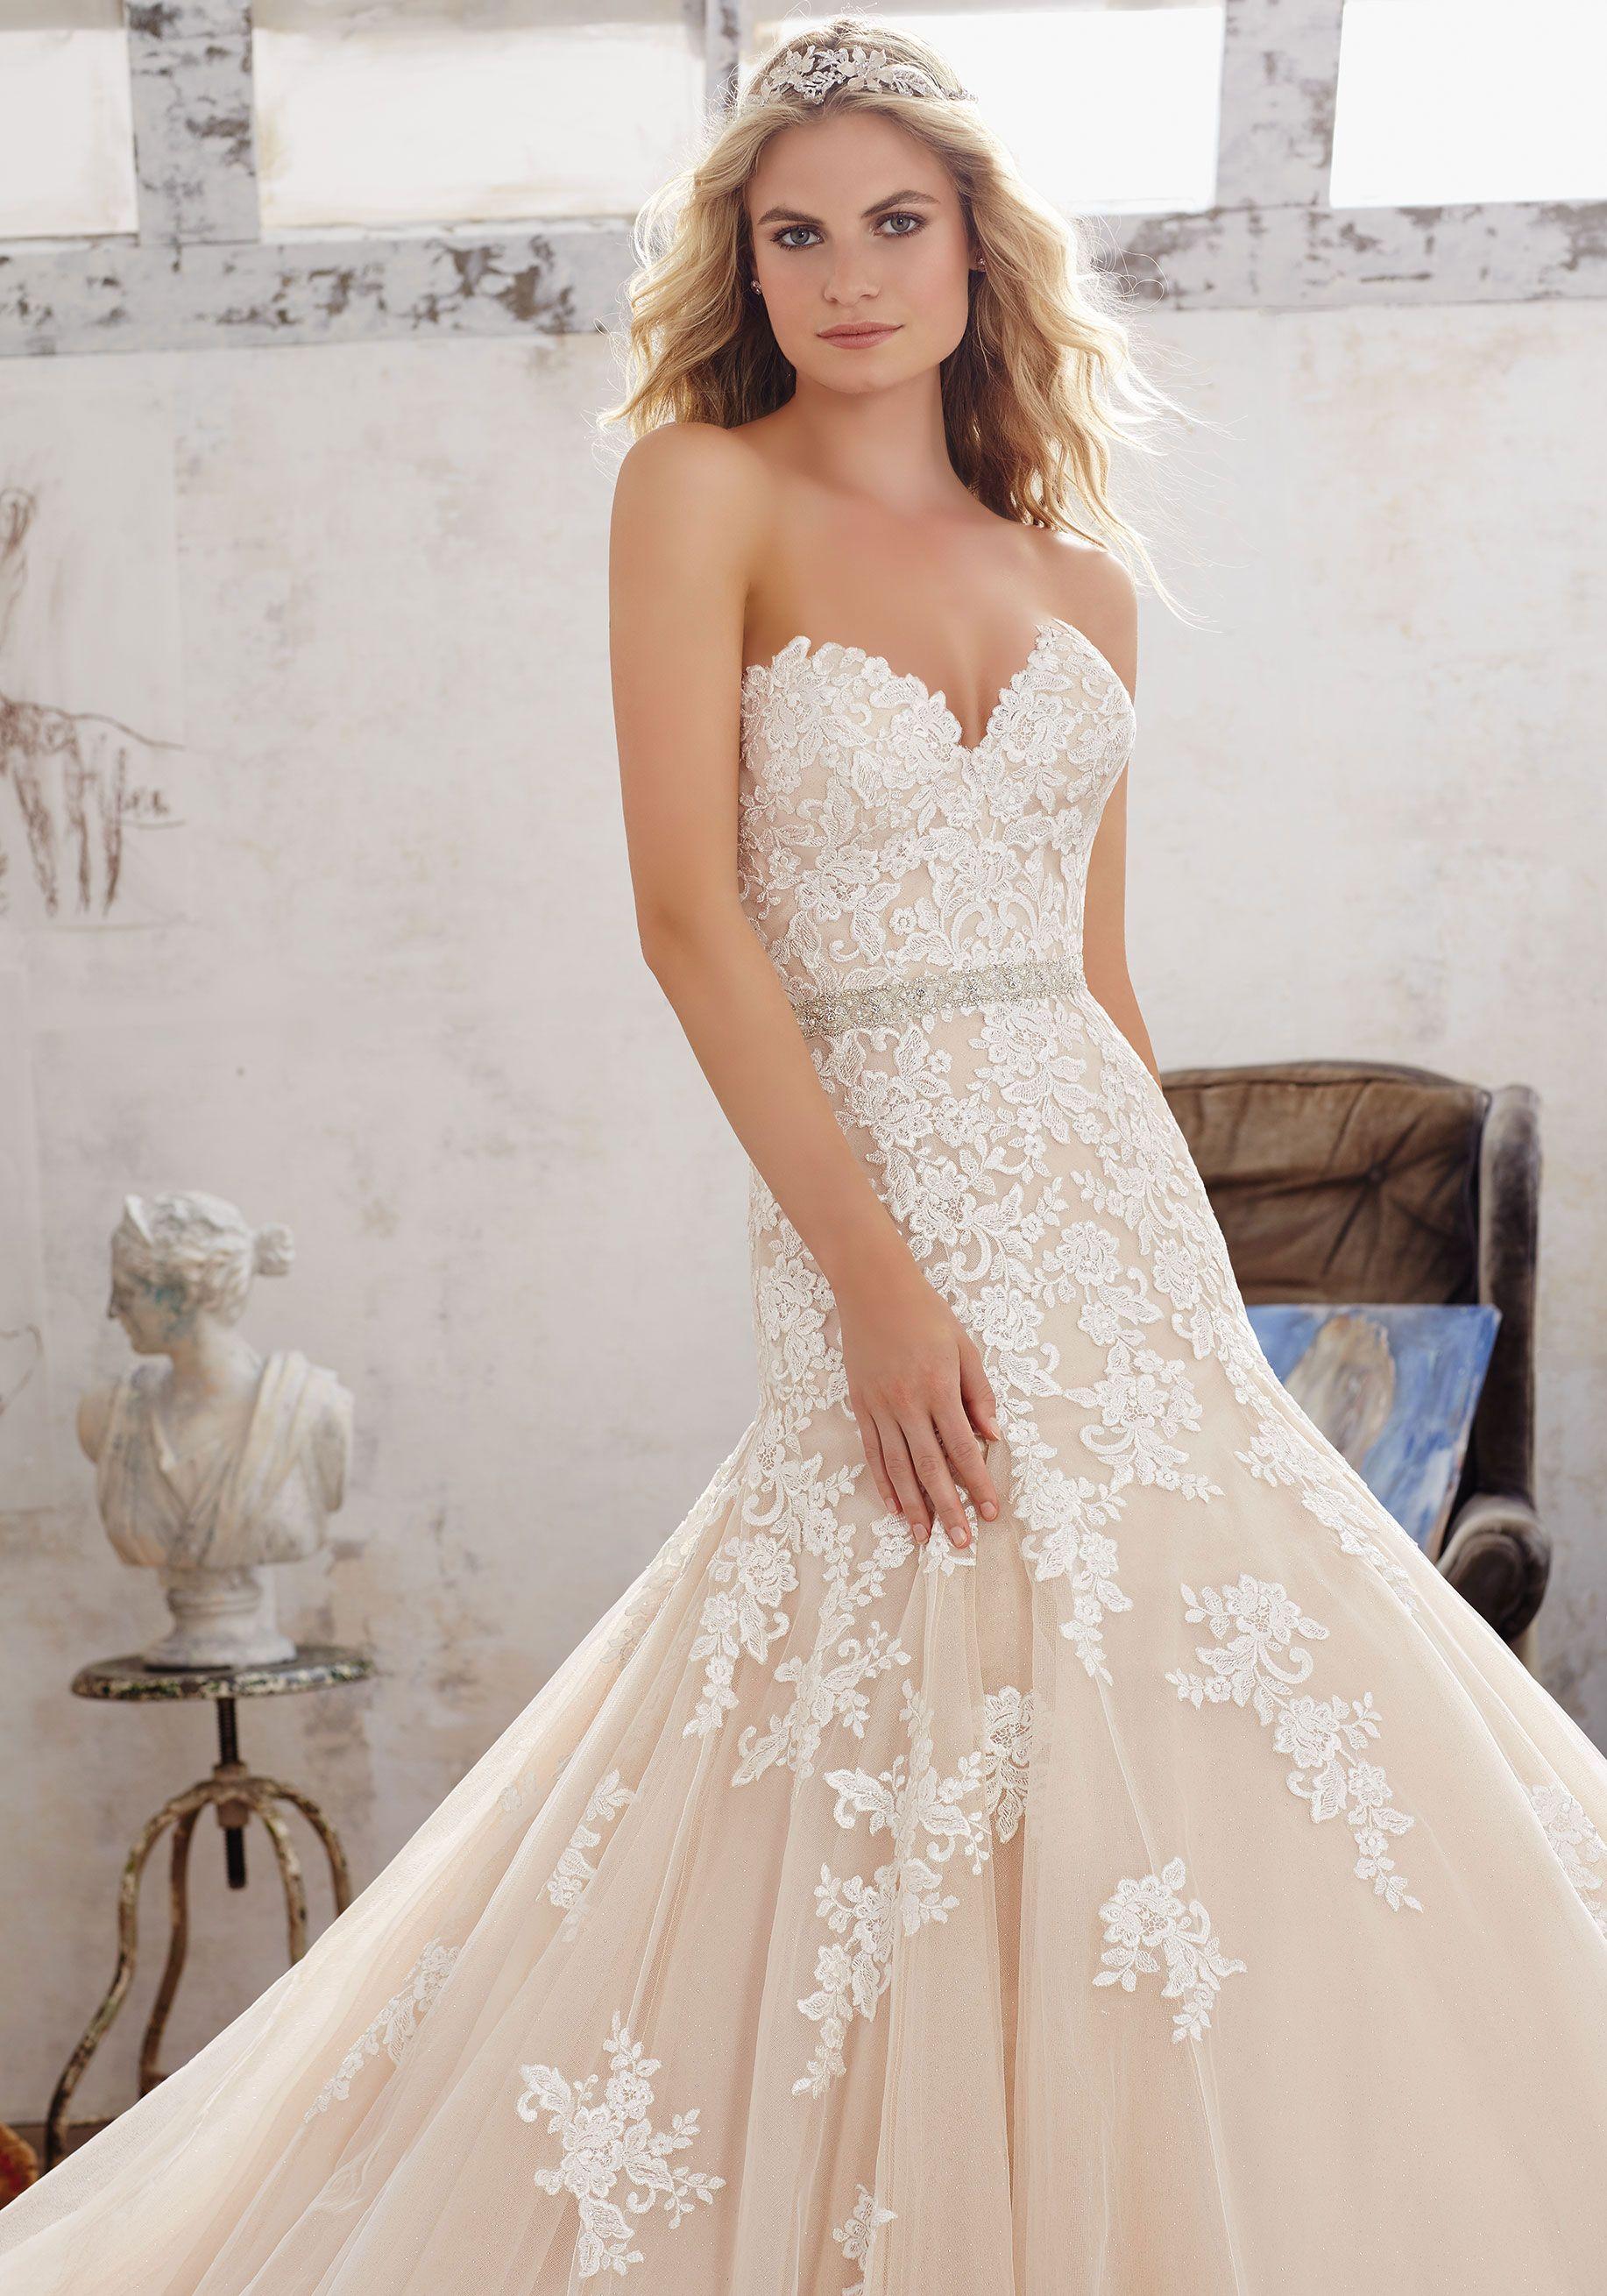 Mackenzie Wedding Dress Morilee Mori Lee Wedding Dress Fit And Flare Wedding Dress Spring Wedding Dress